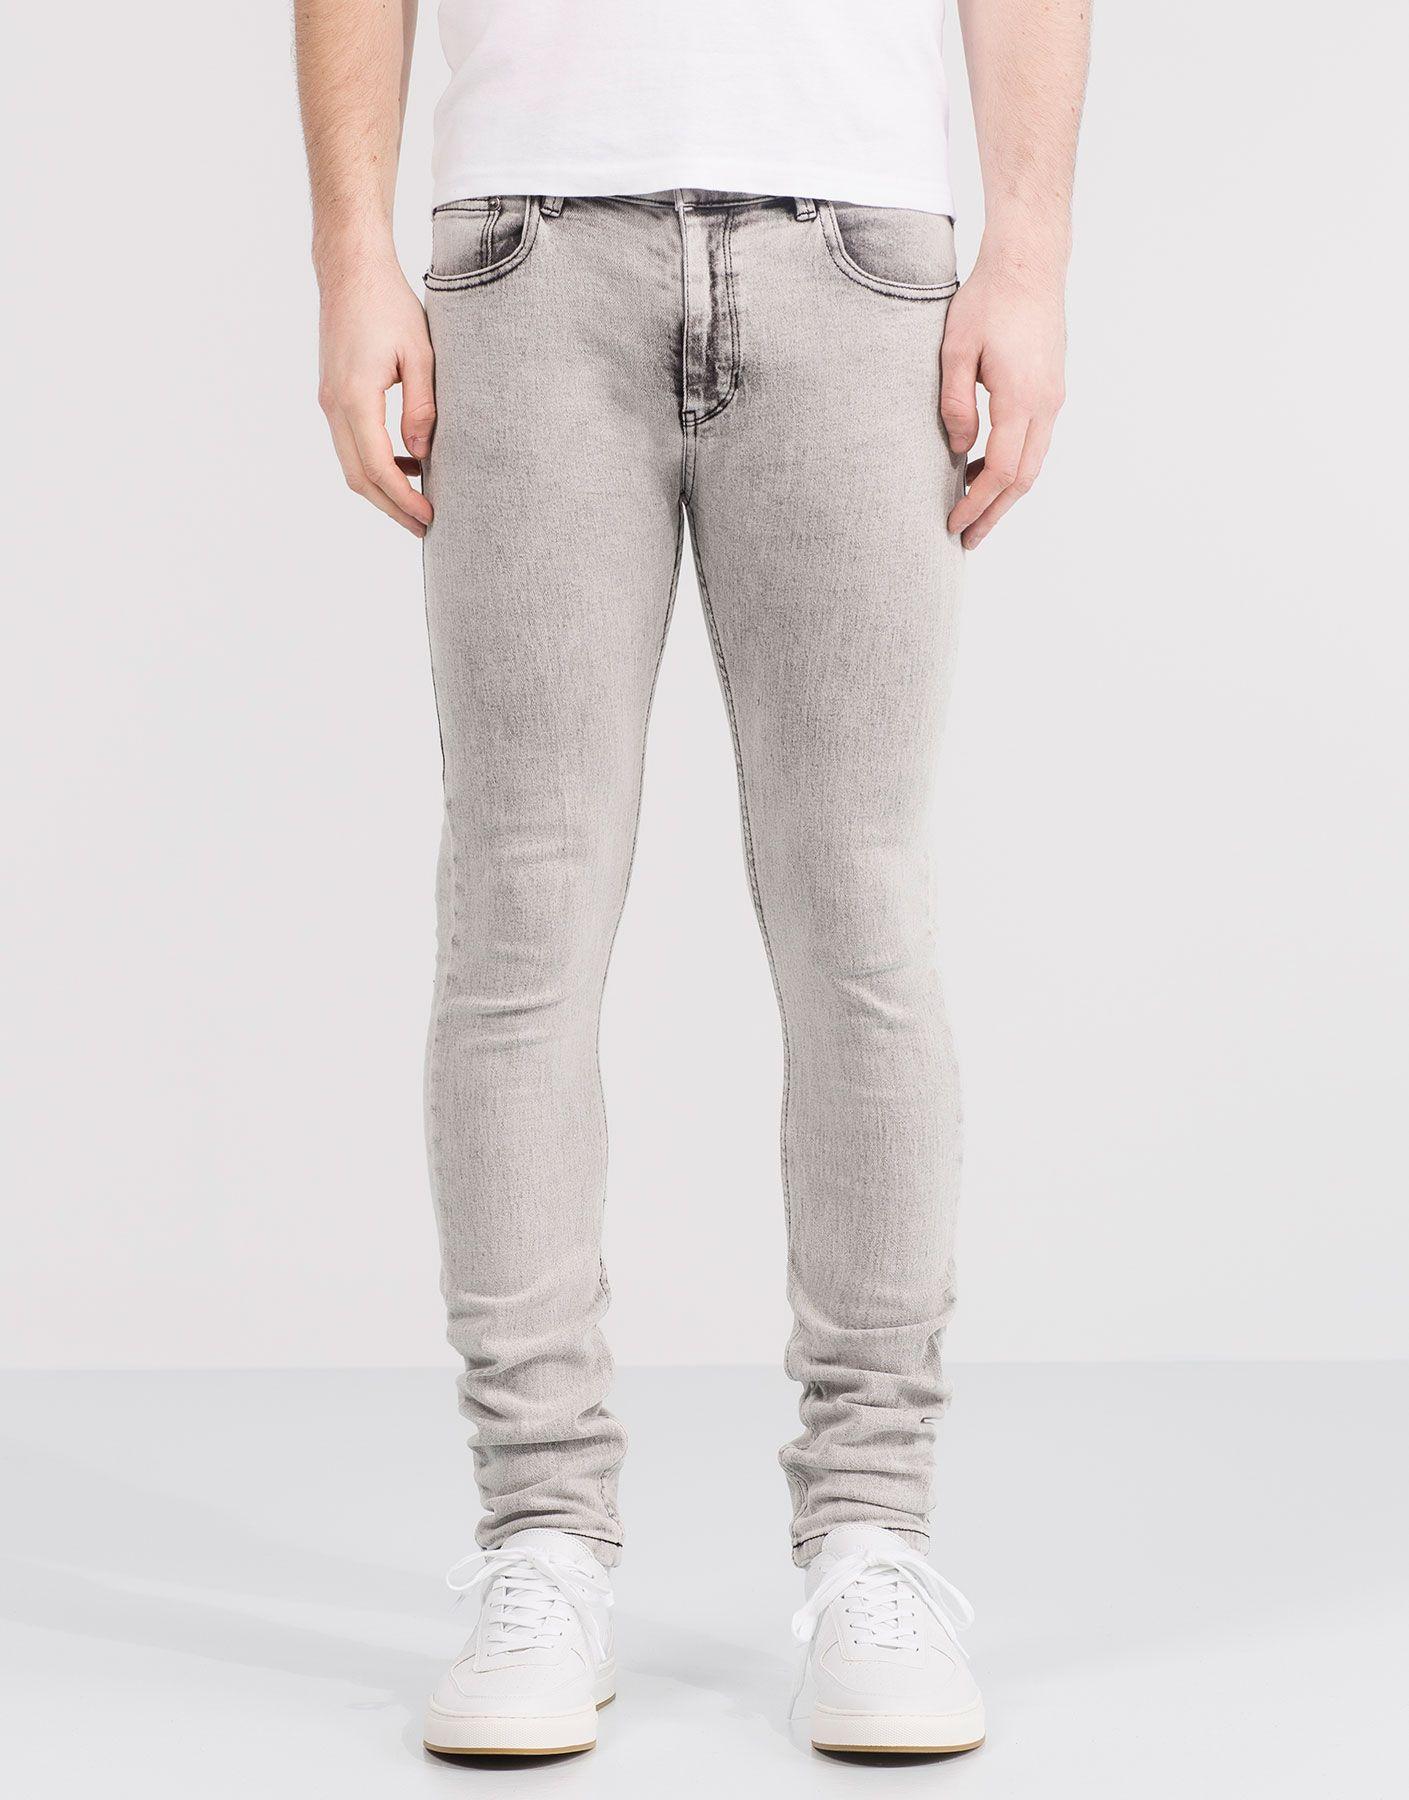 Skinny Super Jeans Acid Vaqueros WashPantalones Fit y0m8wNOnv